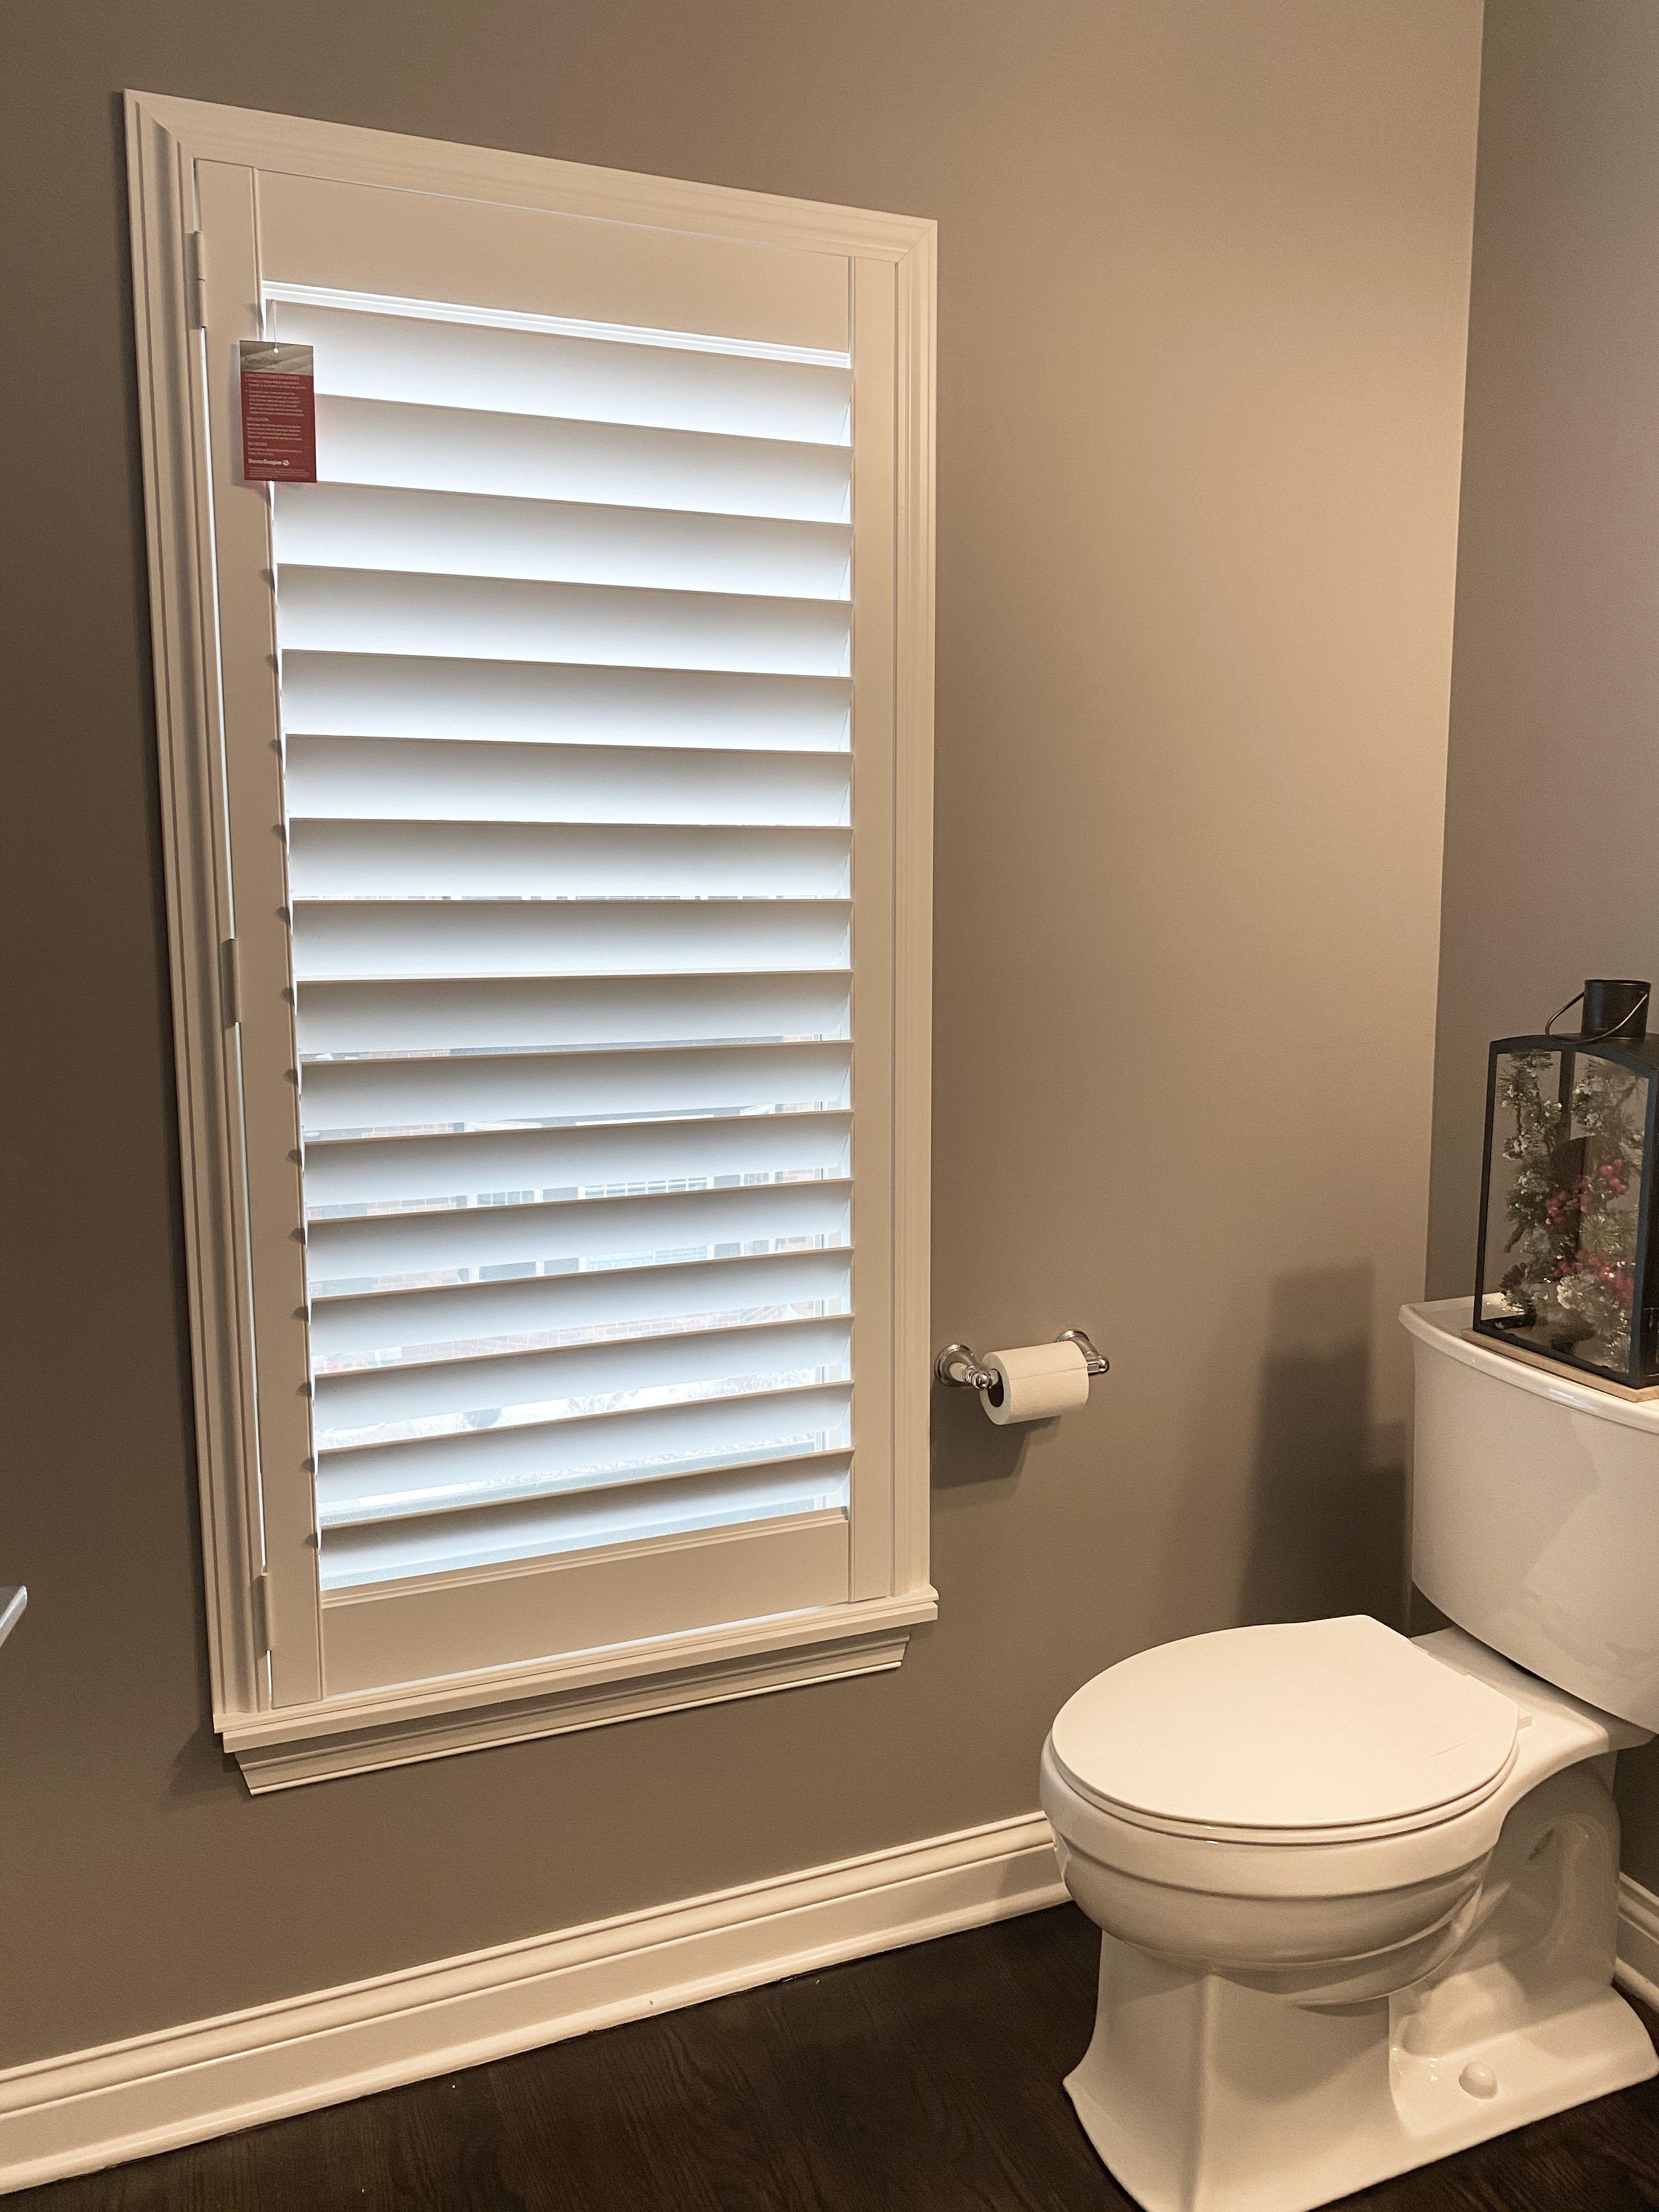 Shutters For A Powder Room In Libertyville Il In 2020 Hunter Douglas Shutters Window Design Shutters